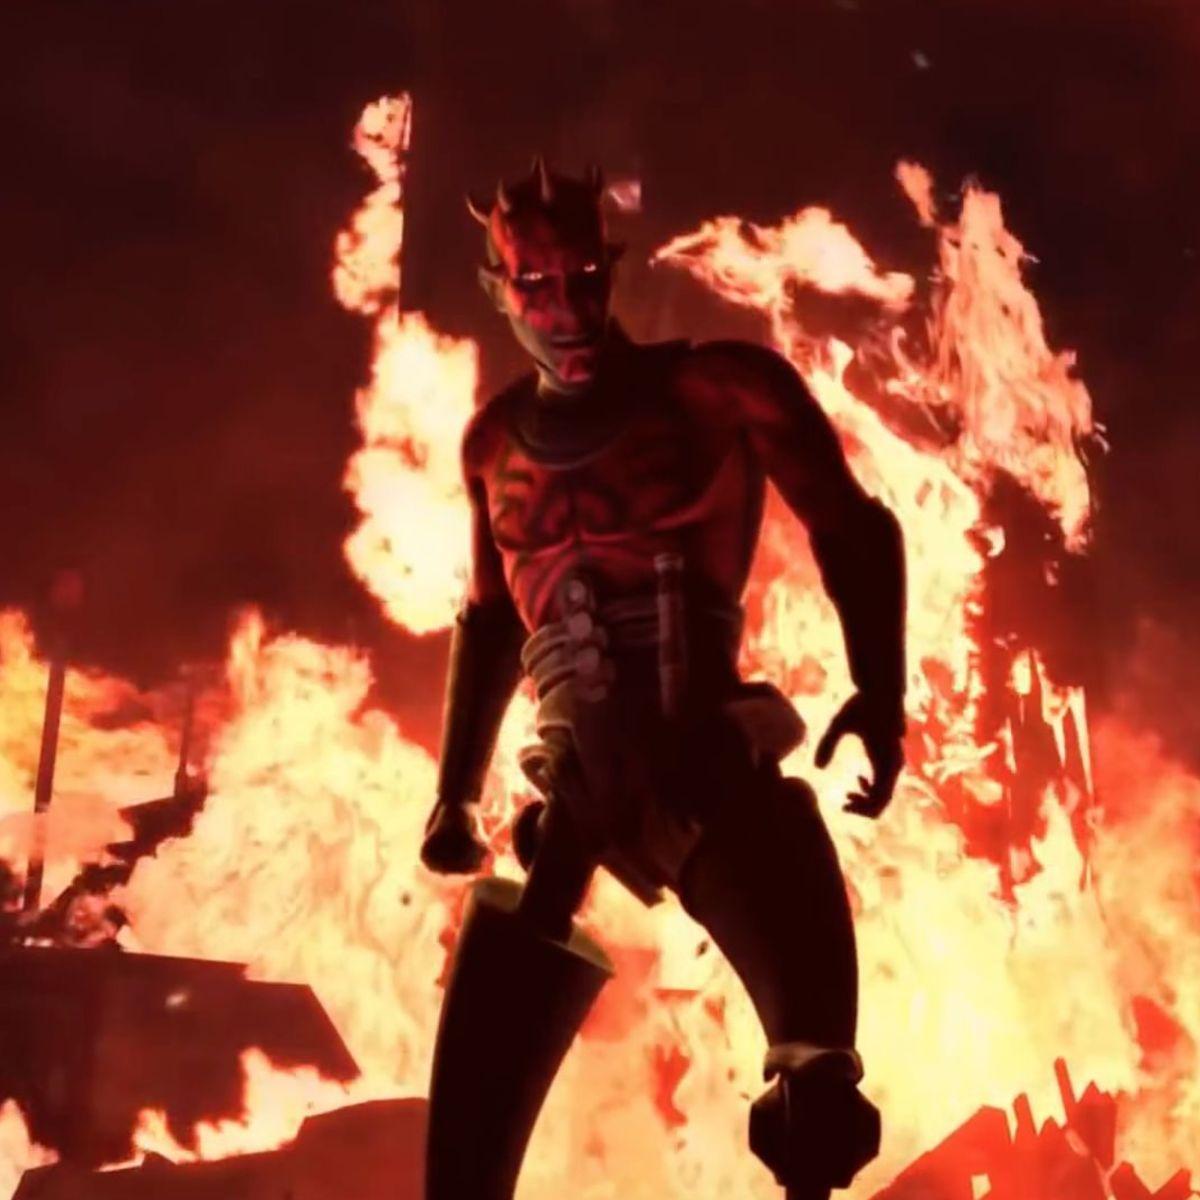 Maul returns in Star Wars: The Clone Wars